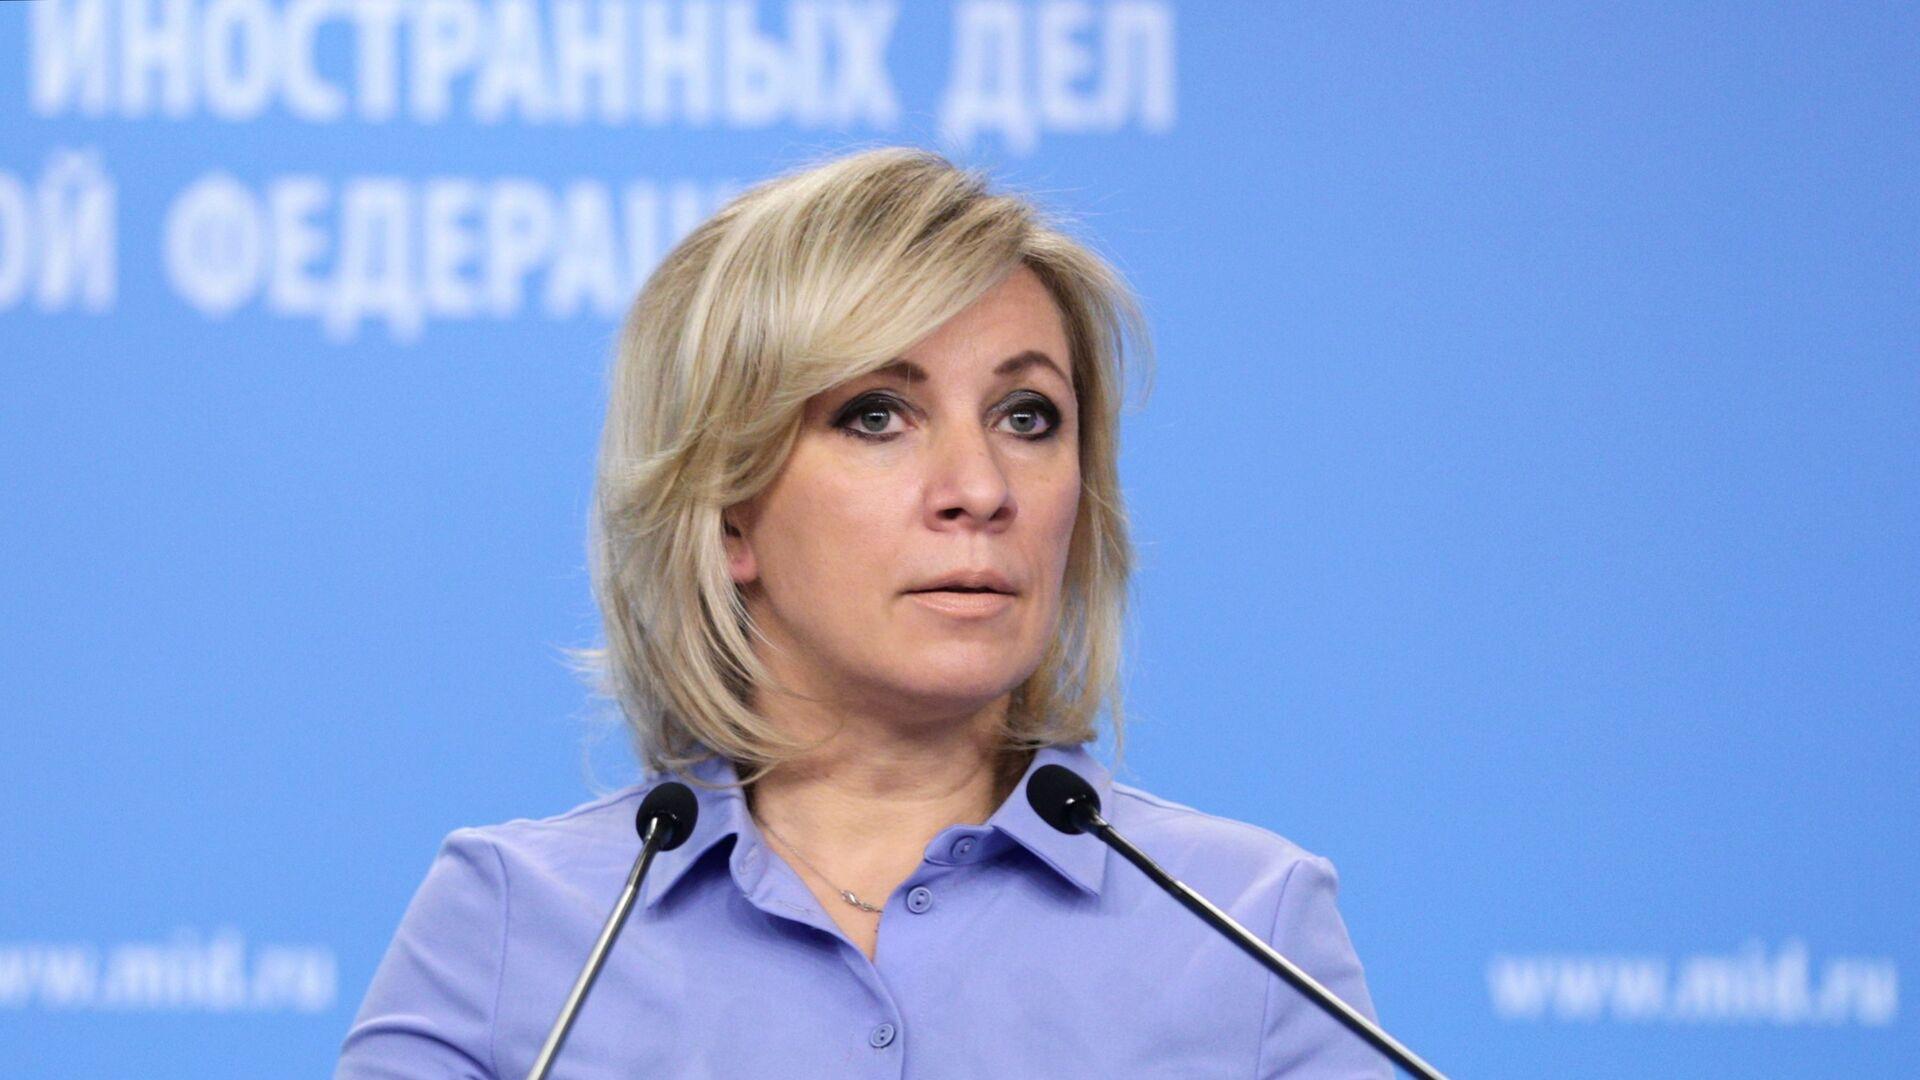 María Zajárova, portavoz del Ministério de Exteriores de Rusia - Sputnik Mundo, 1920, 17.03.2021